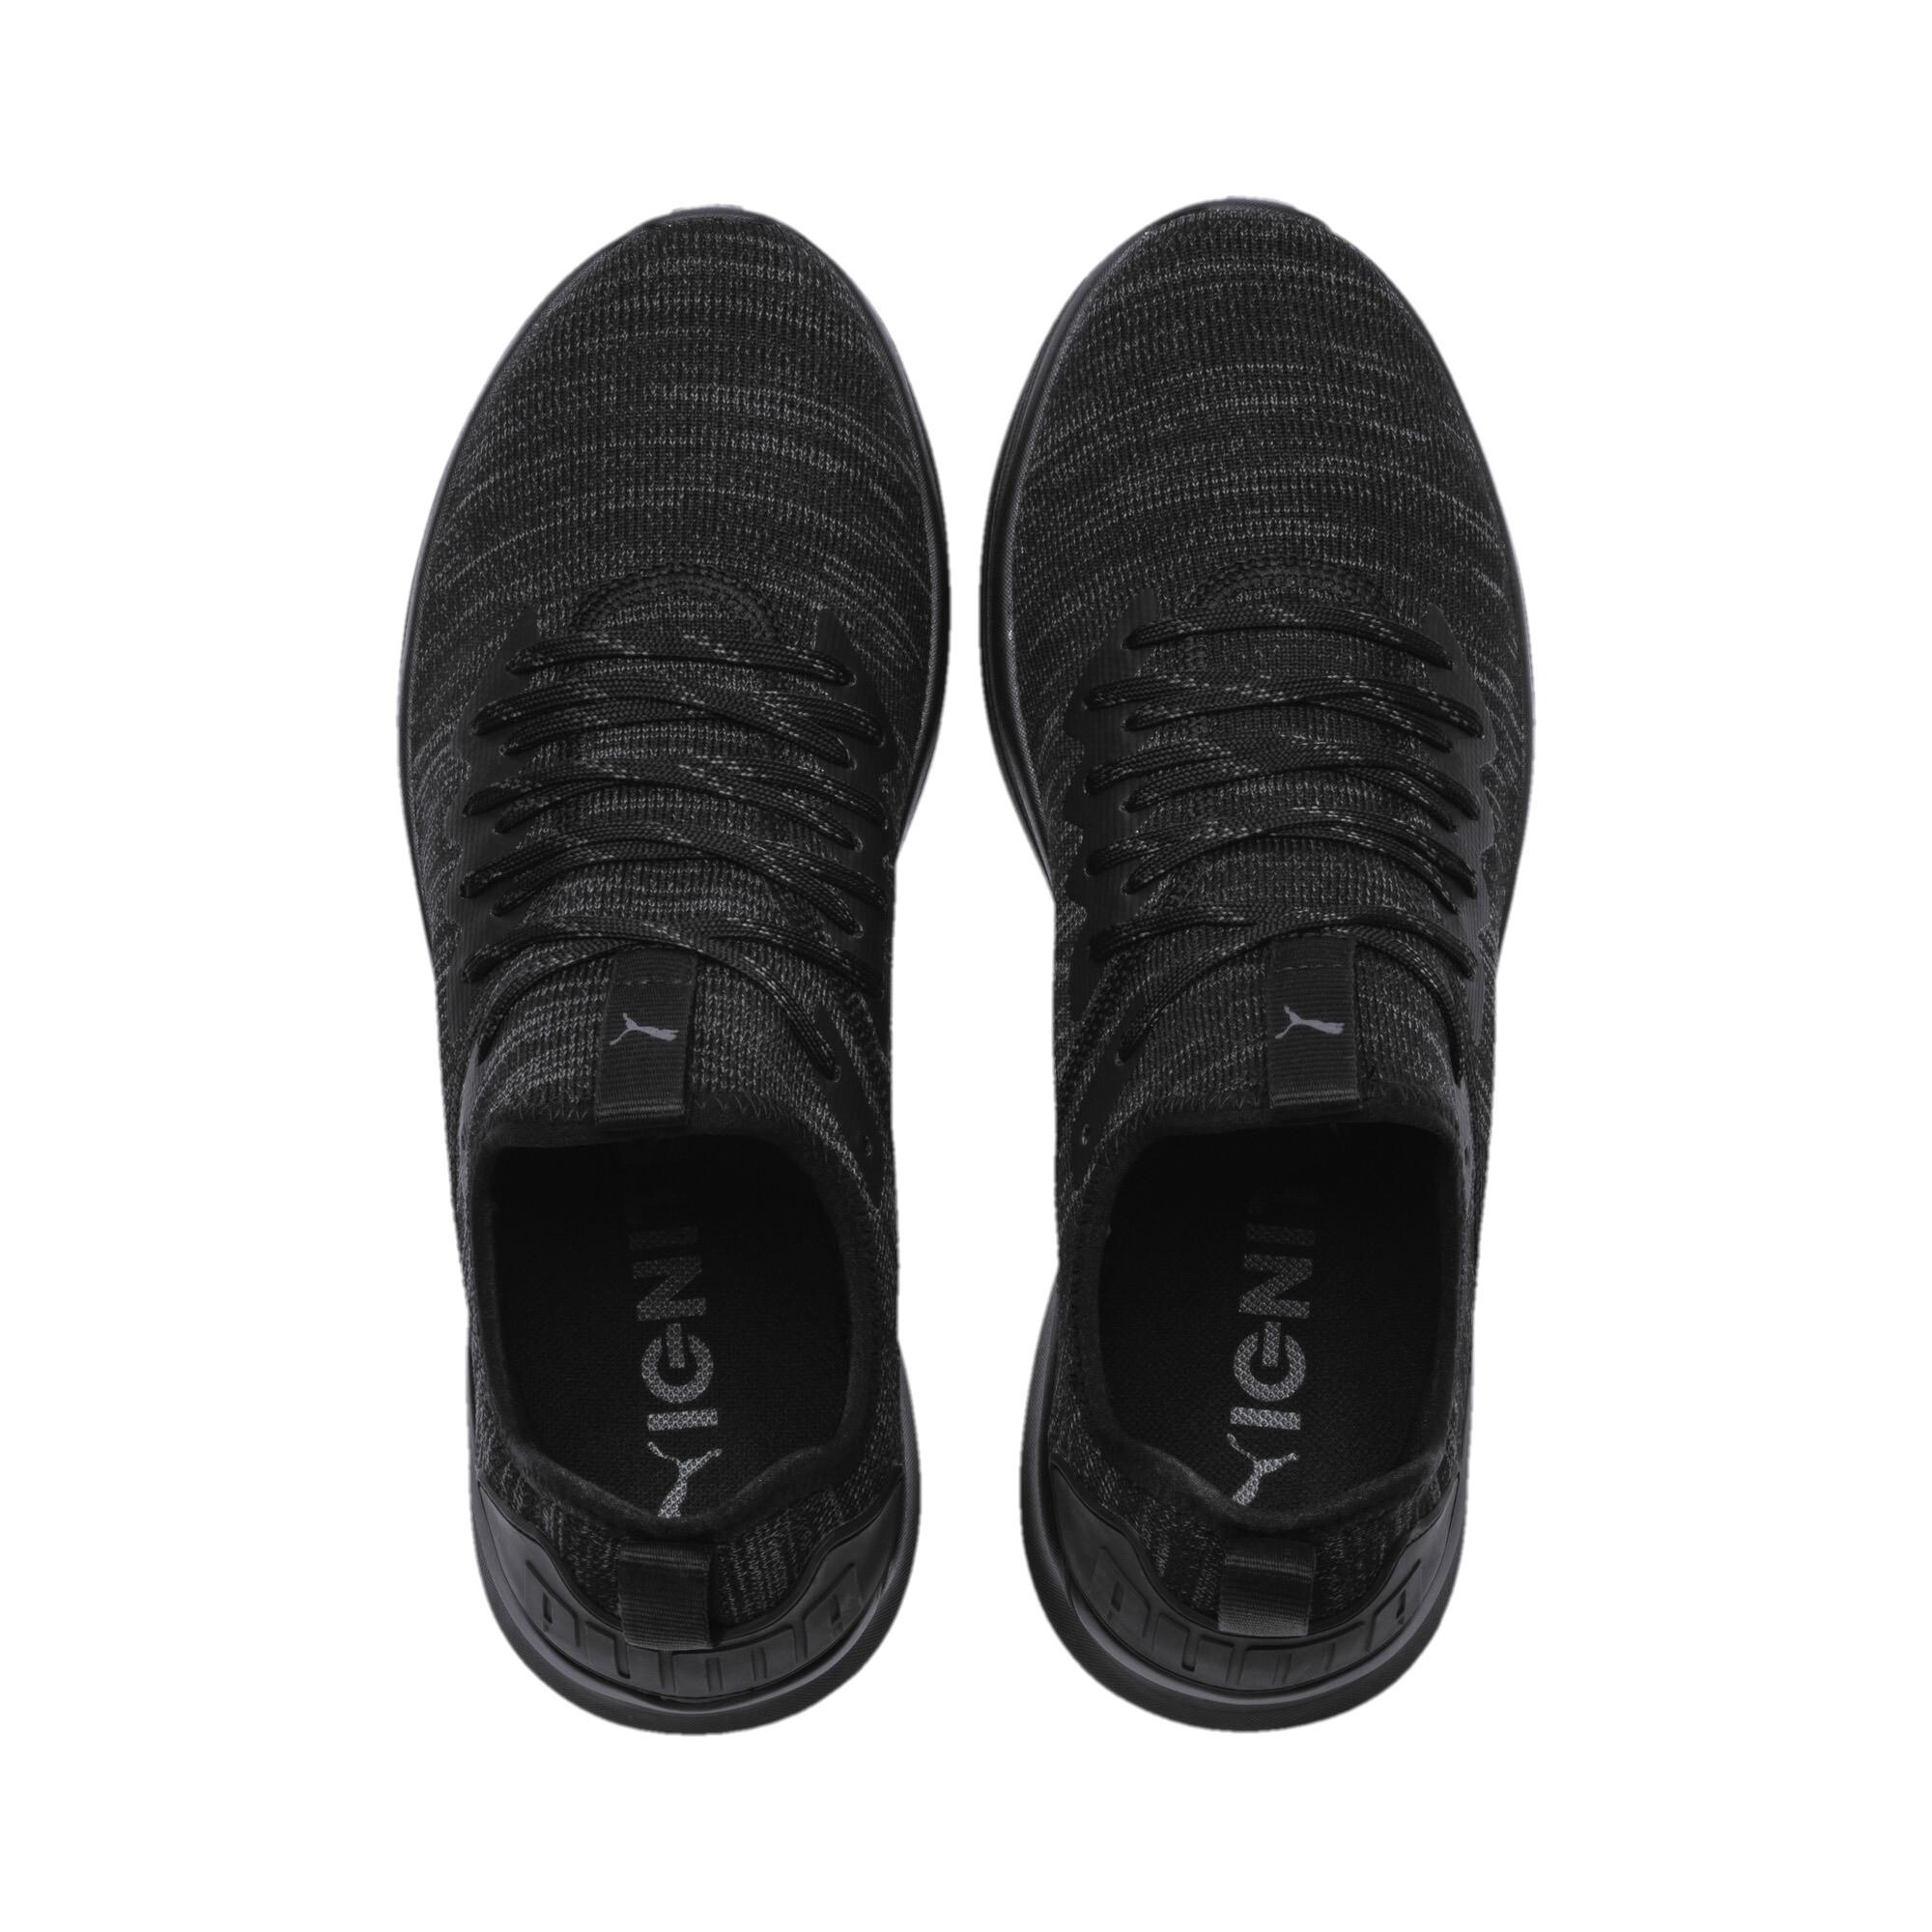 70ae192a Shoes10 Black Evoknit Men's Ignite Flash Running Puma 2WEDH9I